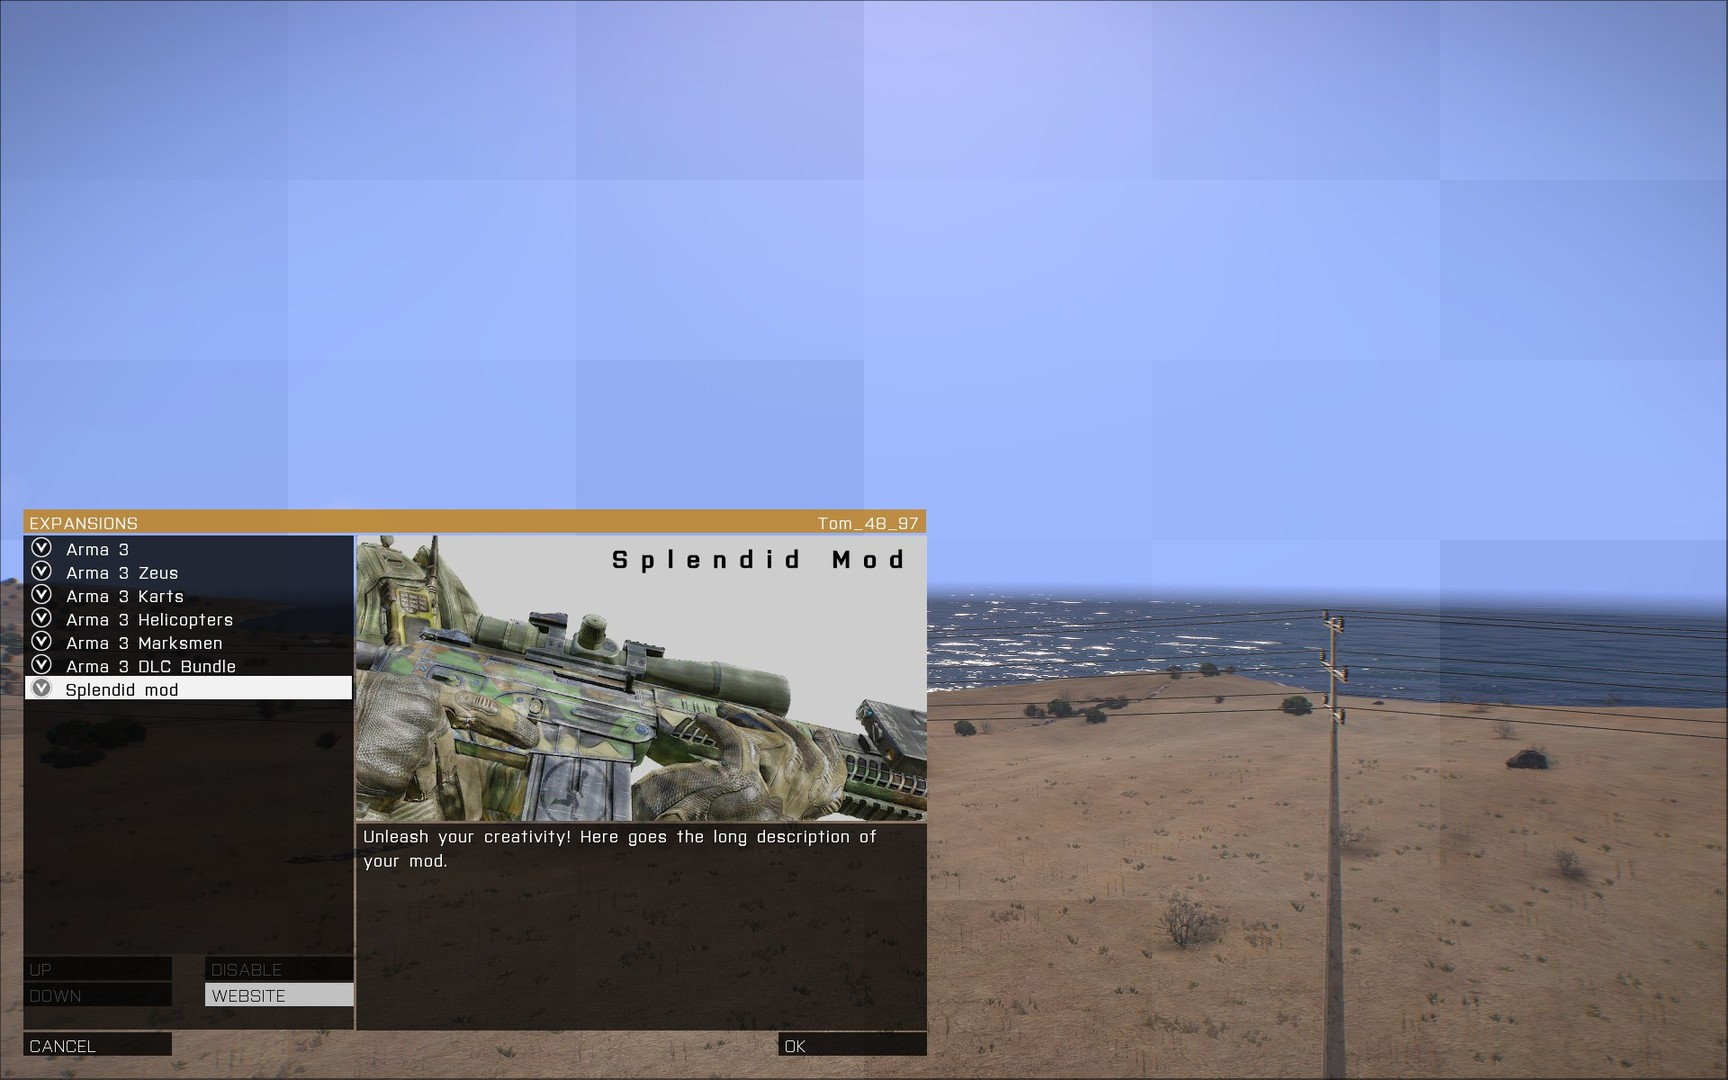 Arma 3 Samples on Steam